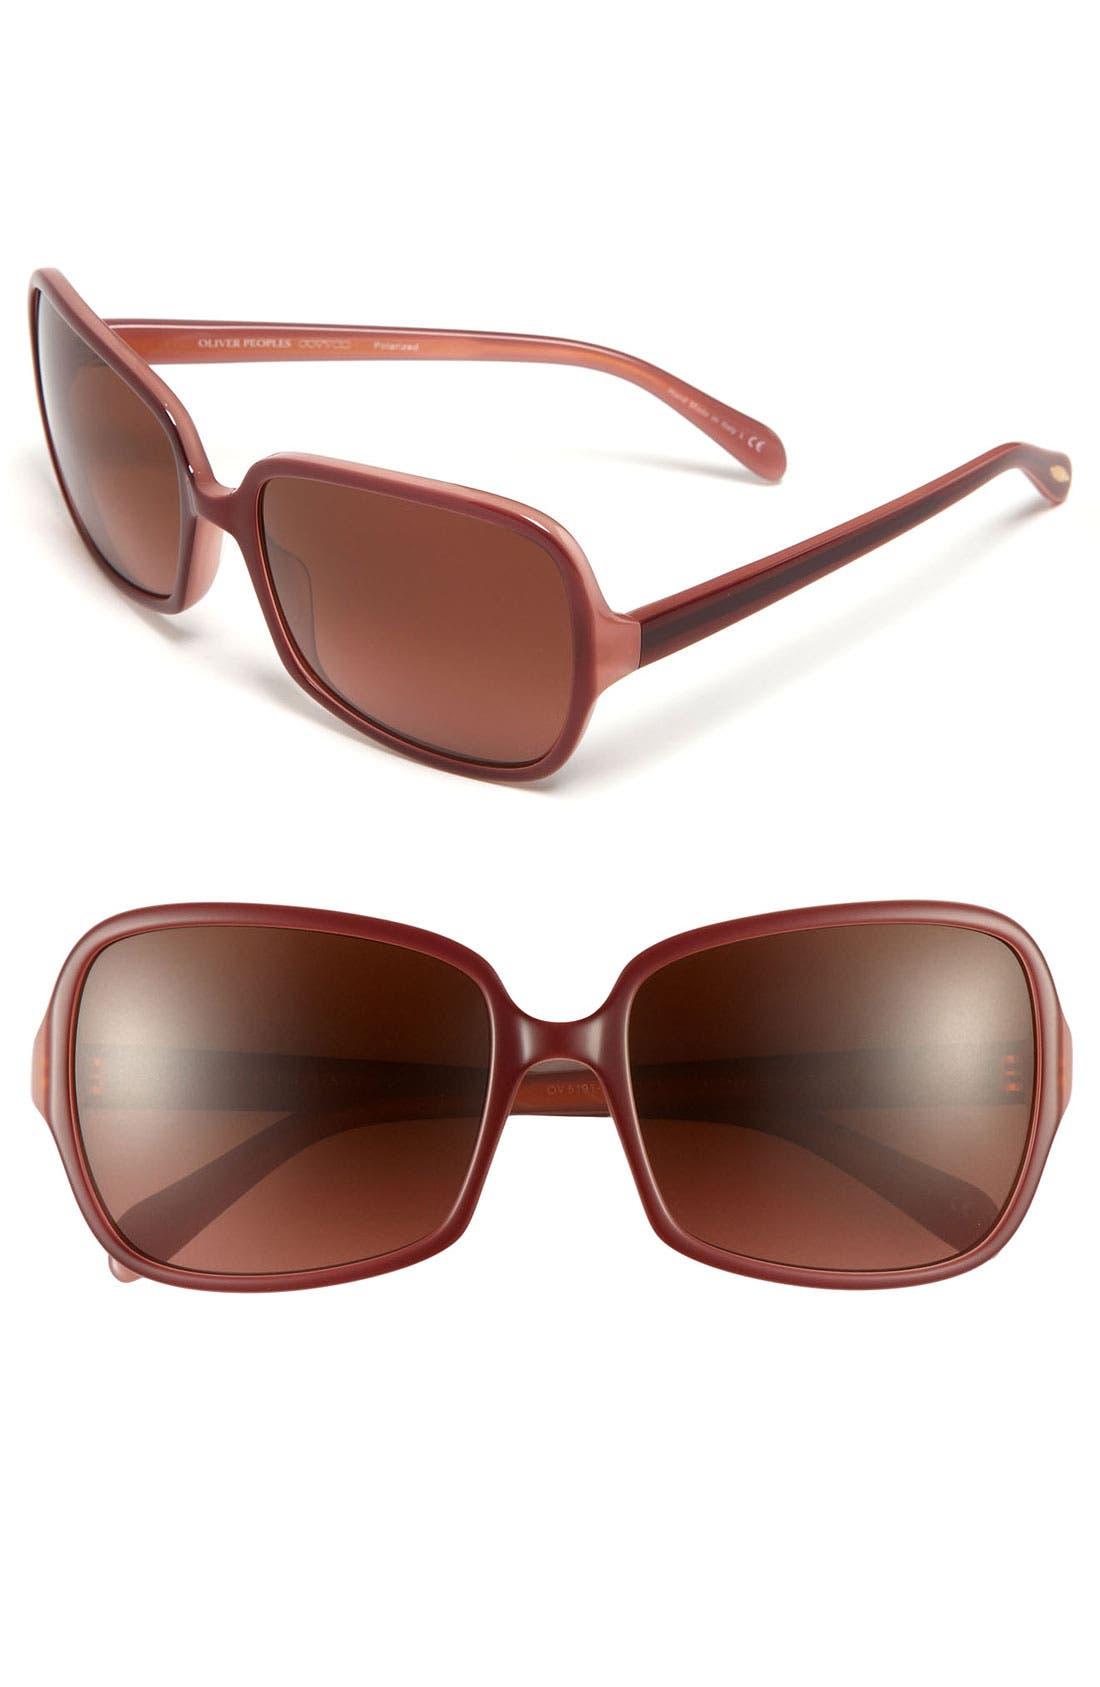 Main Image - Oliver Peoples 'Francesca' Polarized Sunglasses